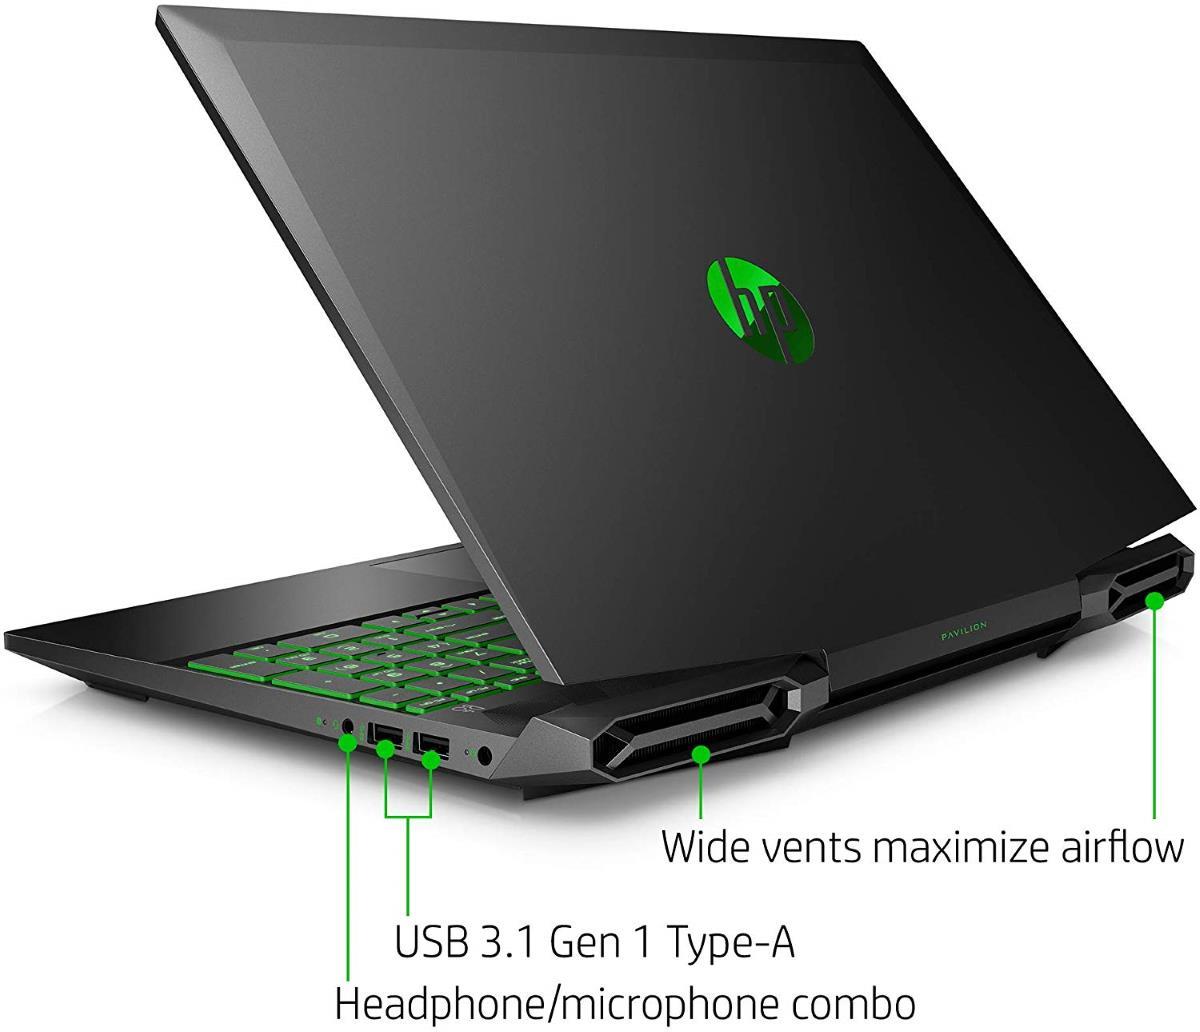 Hp Pavilion 15 Dk0068wm Gaming Laptop 15 6 Fhd Intel Core I5 9300h Nvidia Geforce Gtx 1050 3gb 8gb Ram 256gb Ssd Laptop Pc Specs